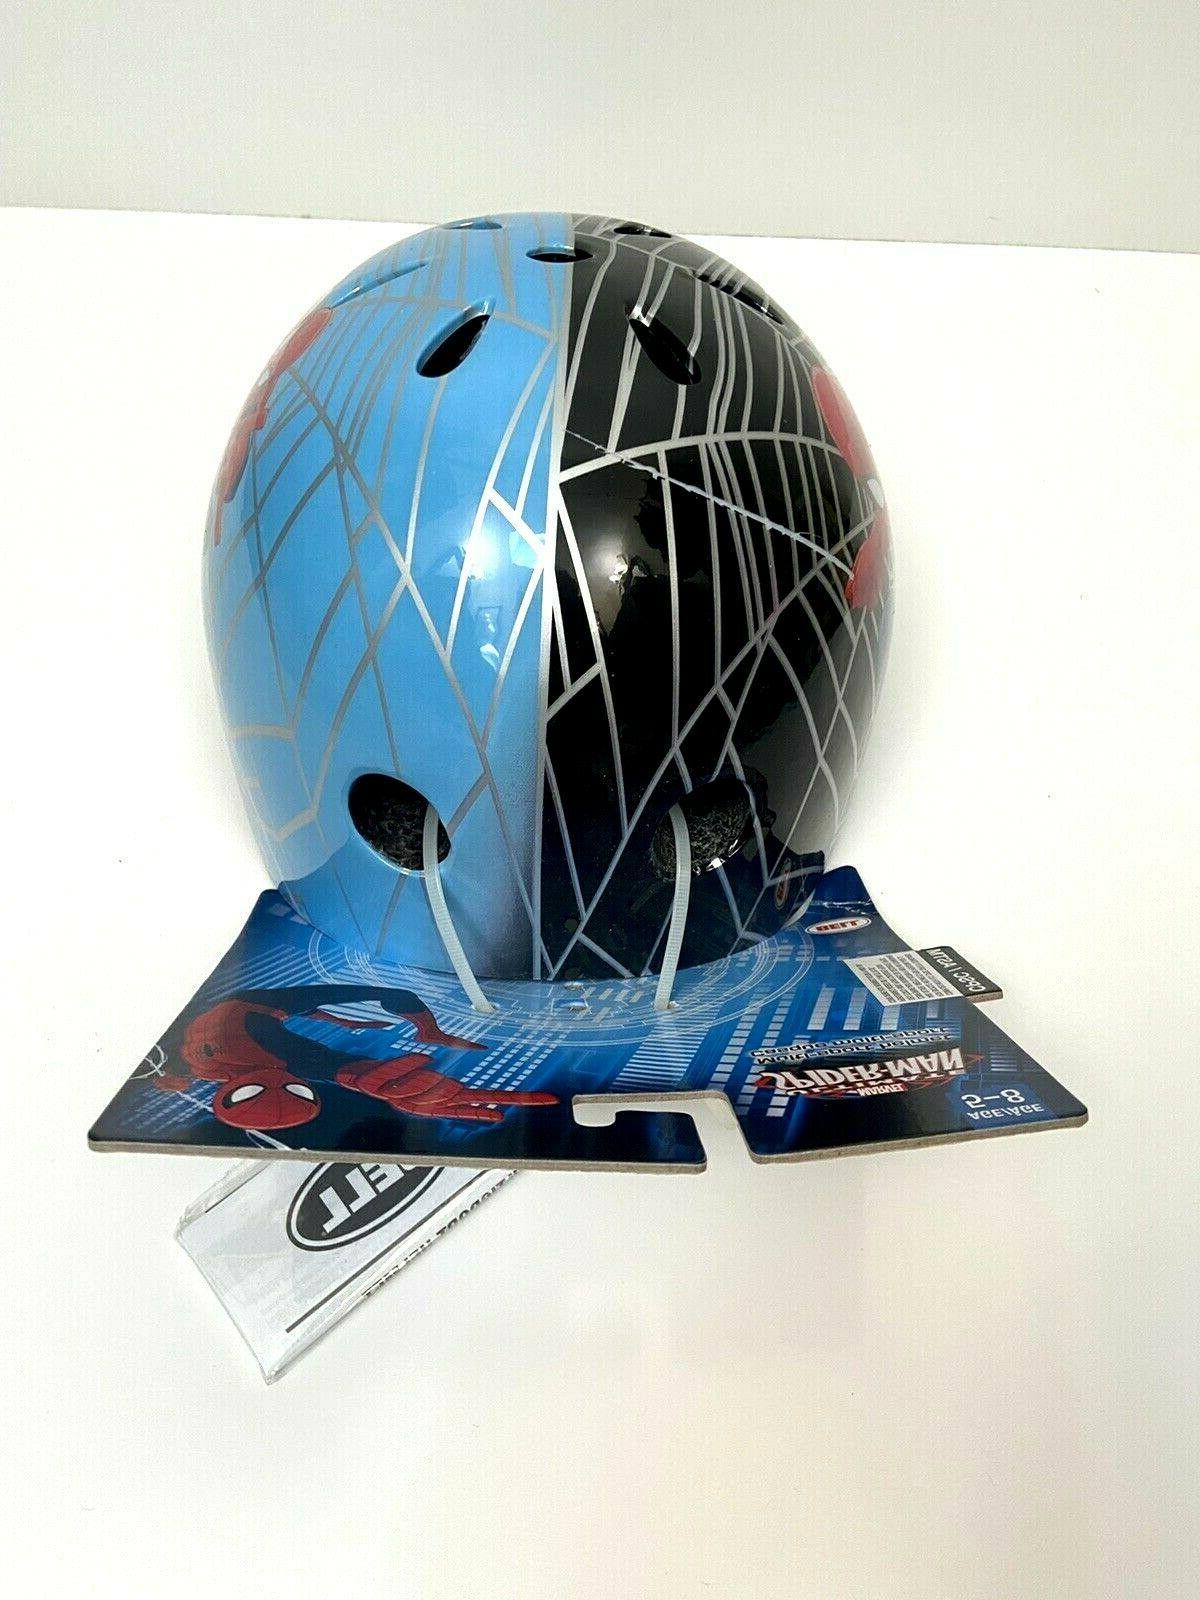 Bell Spiderman Helmet Multisport Two Tone Spidey Gear